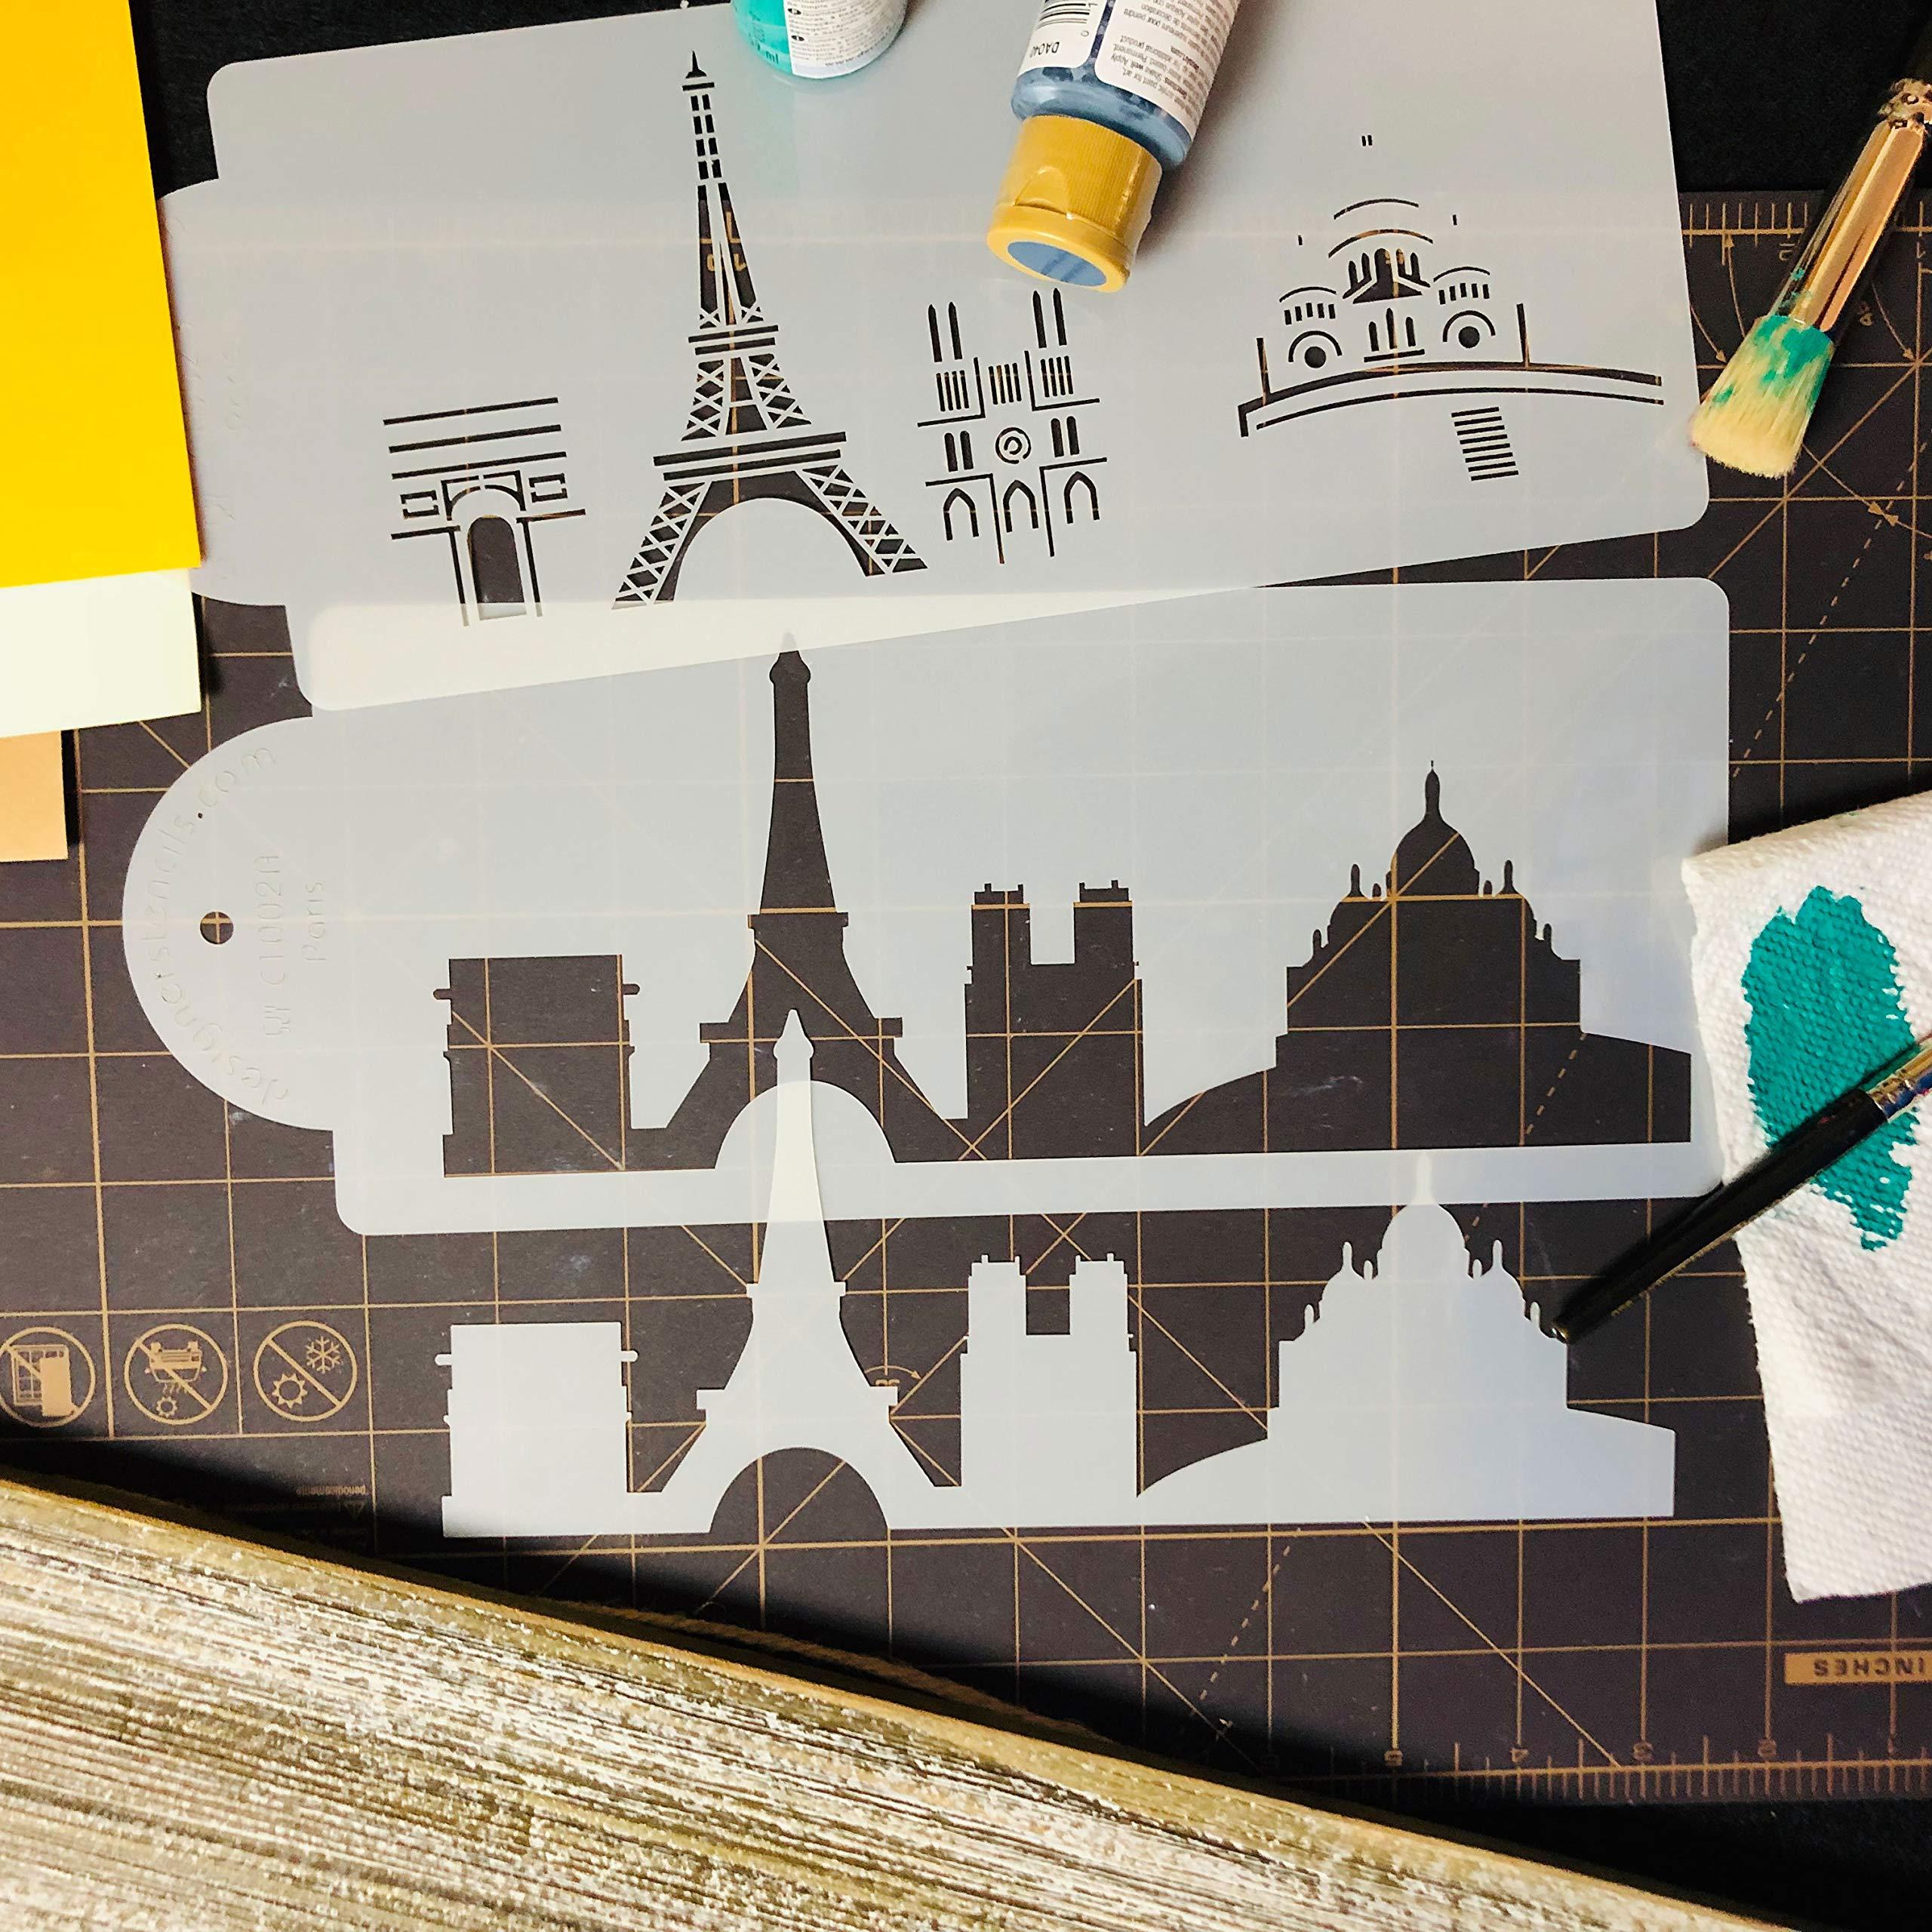 Paris Detailed Skyline Cake Stencil Side C1002 by Designer Stencils by Designer Stencils